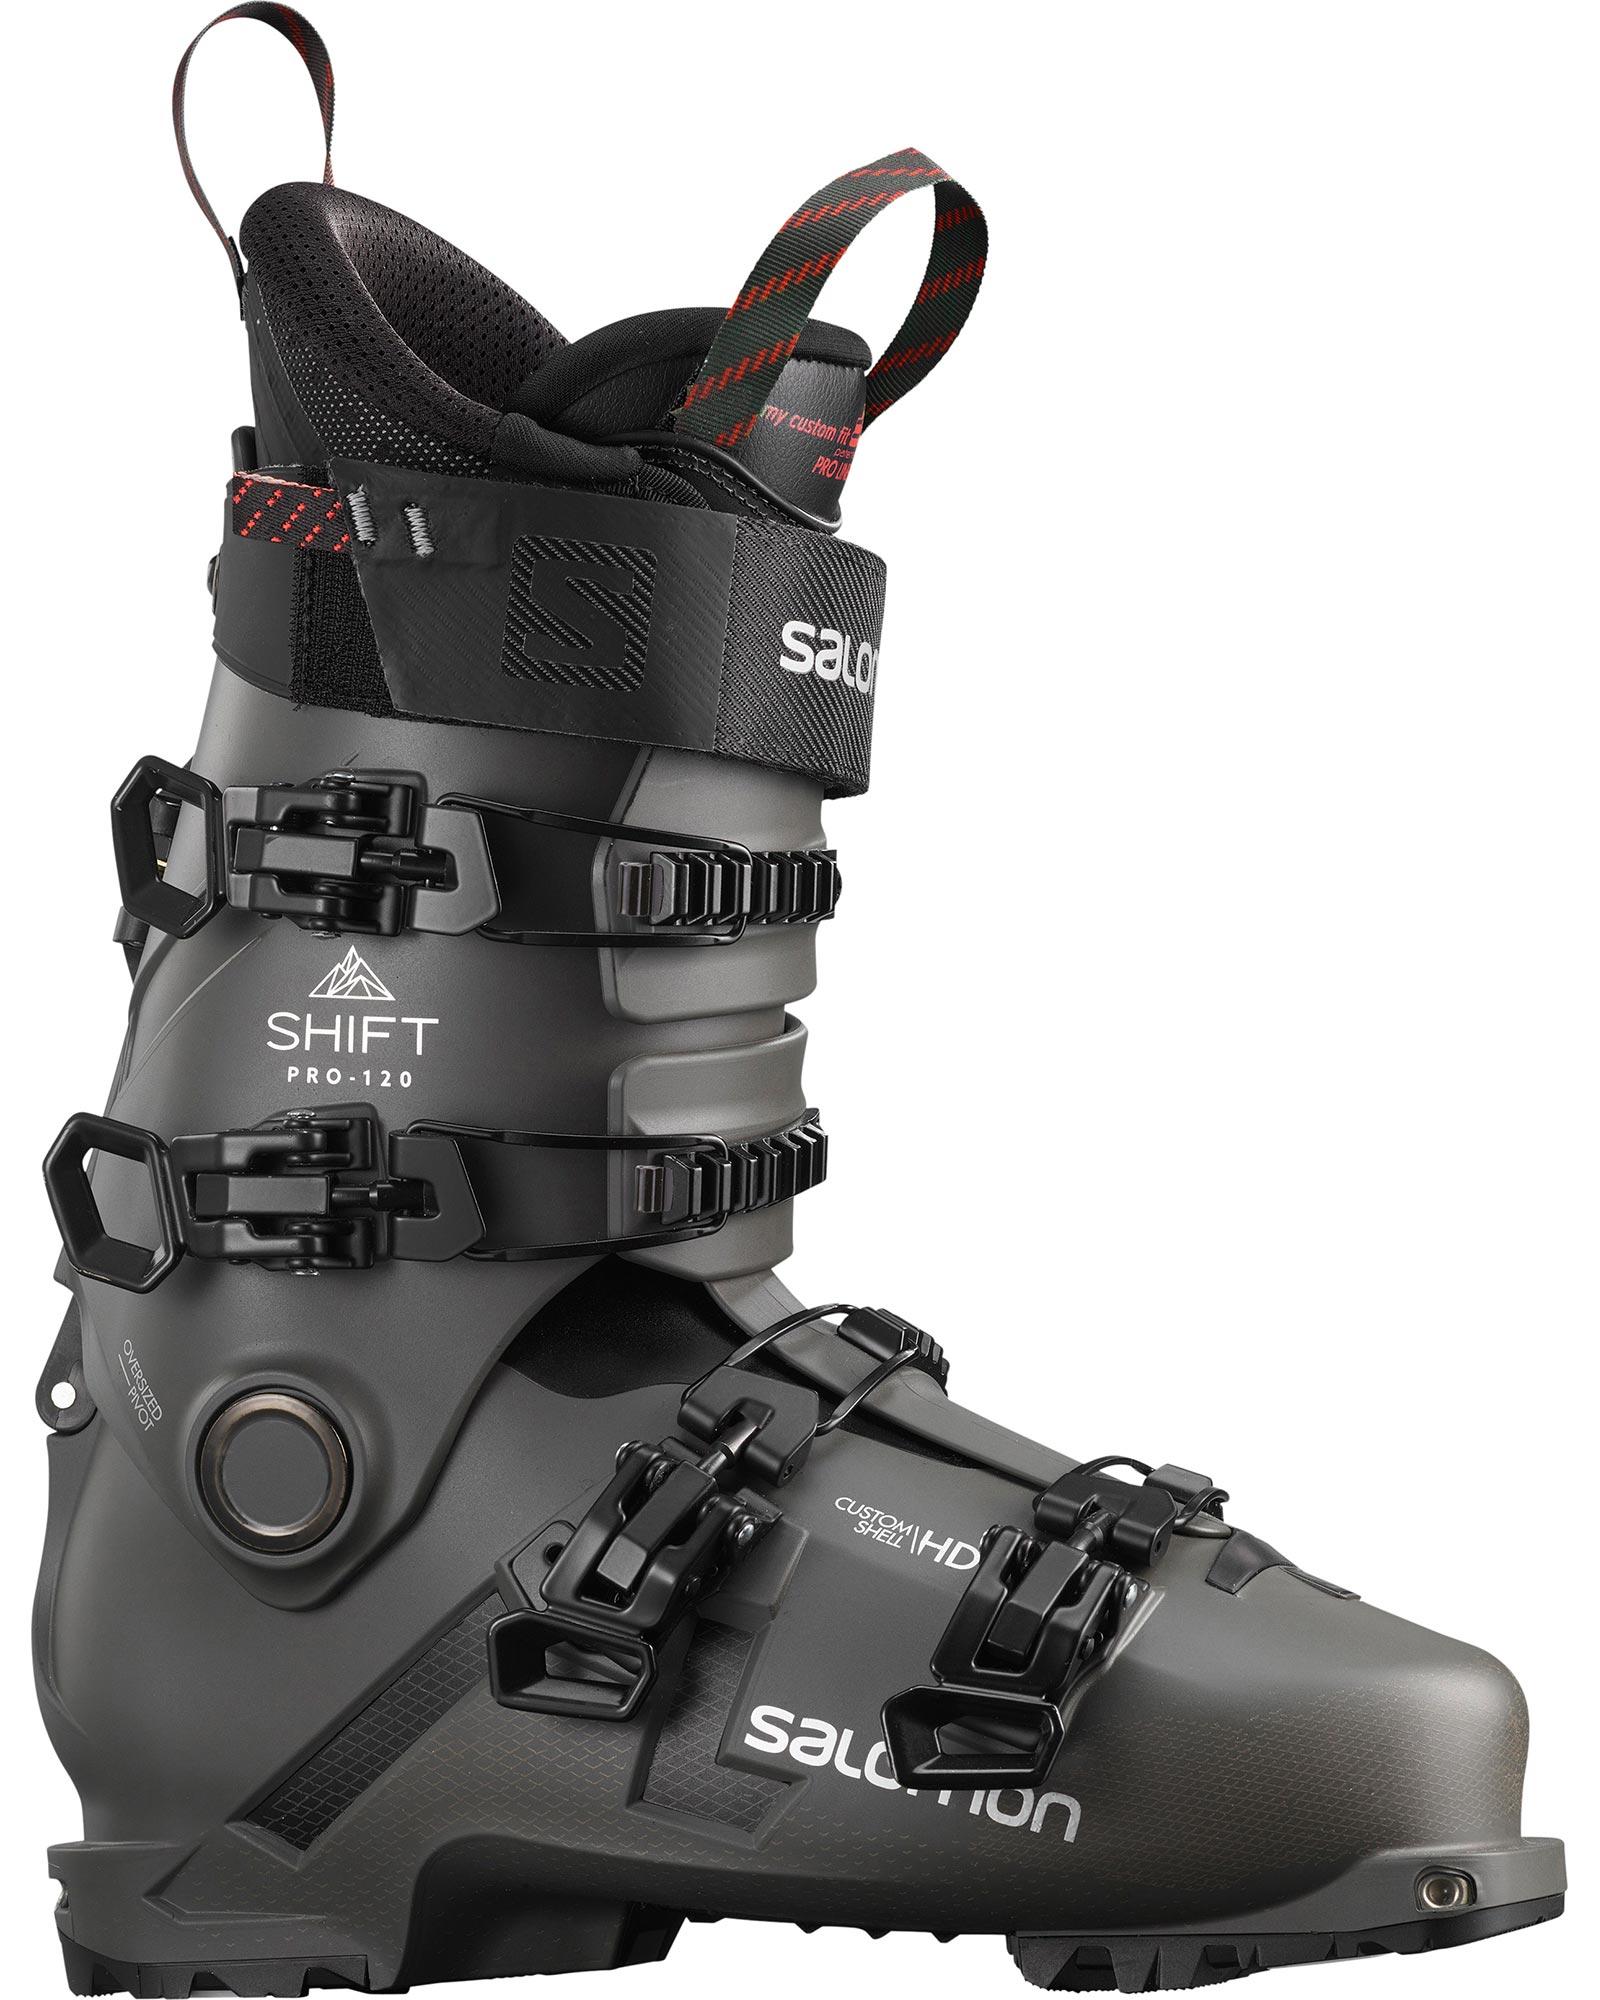 Salomon Men's Shift Pro 120 AT Backcountry Ski Boots 2020 / 2021 0